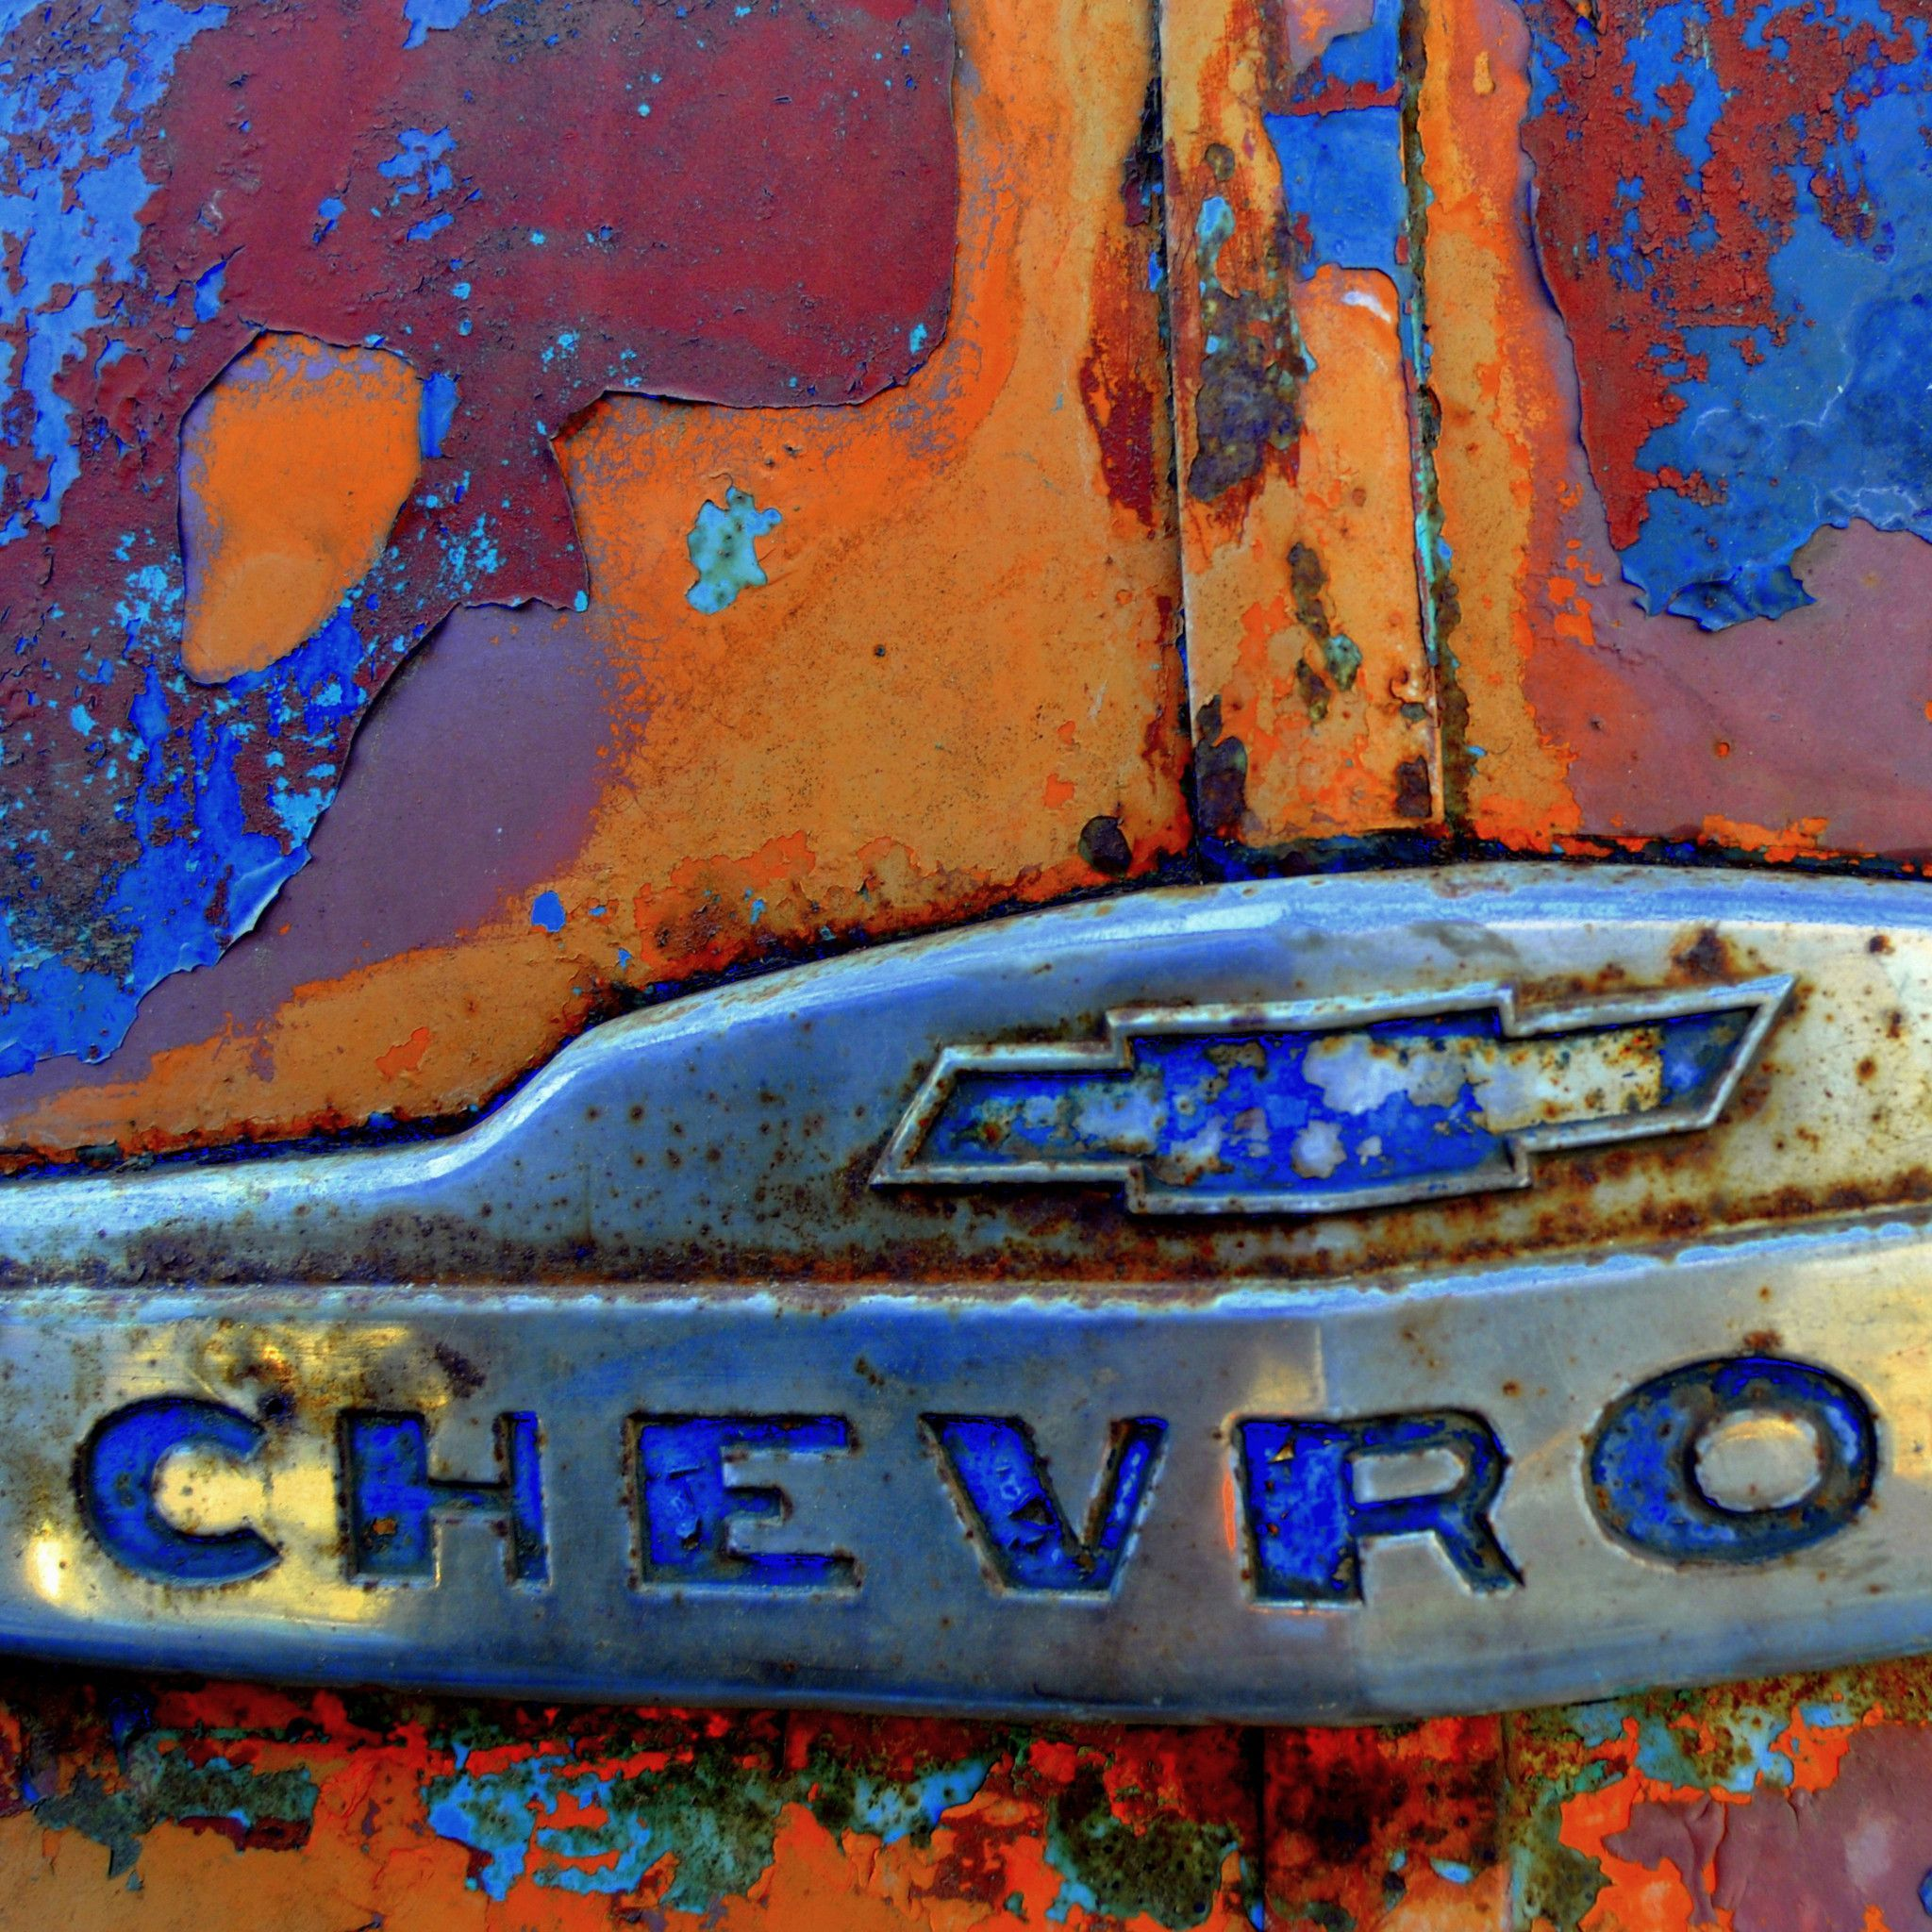 vintage chevrolet truck vintage trucks chevrolet trucks classic chevy trucks pinterest